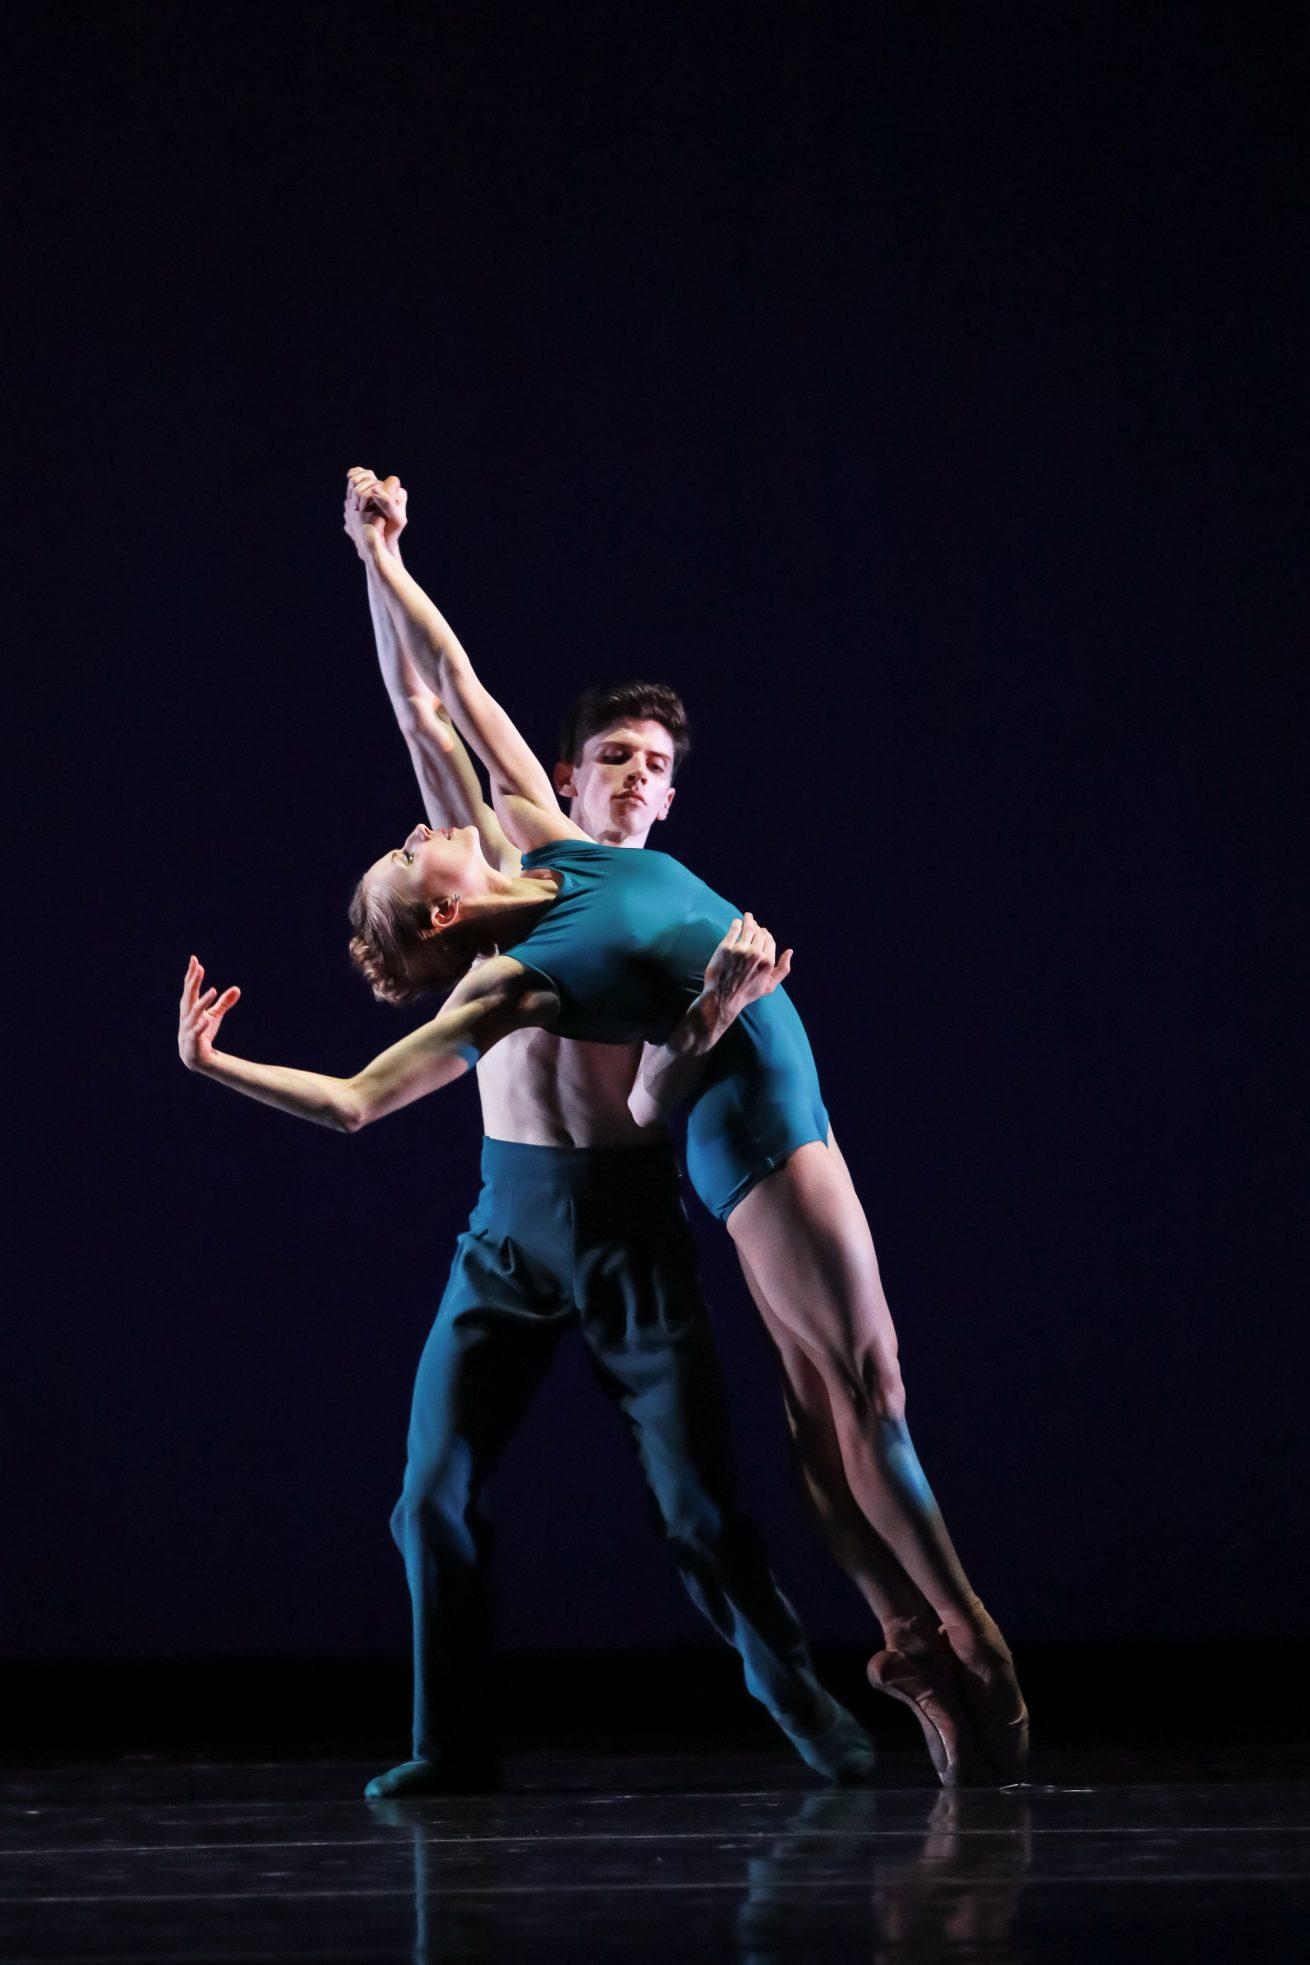 Charlotte Ballet_ Filipe Portugal's Stepping Over_ Lexi Johnston and Peter Mazurowski_photo by Jeff Cravottafix-1150b-8560